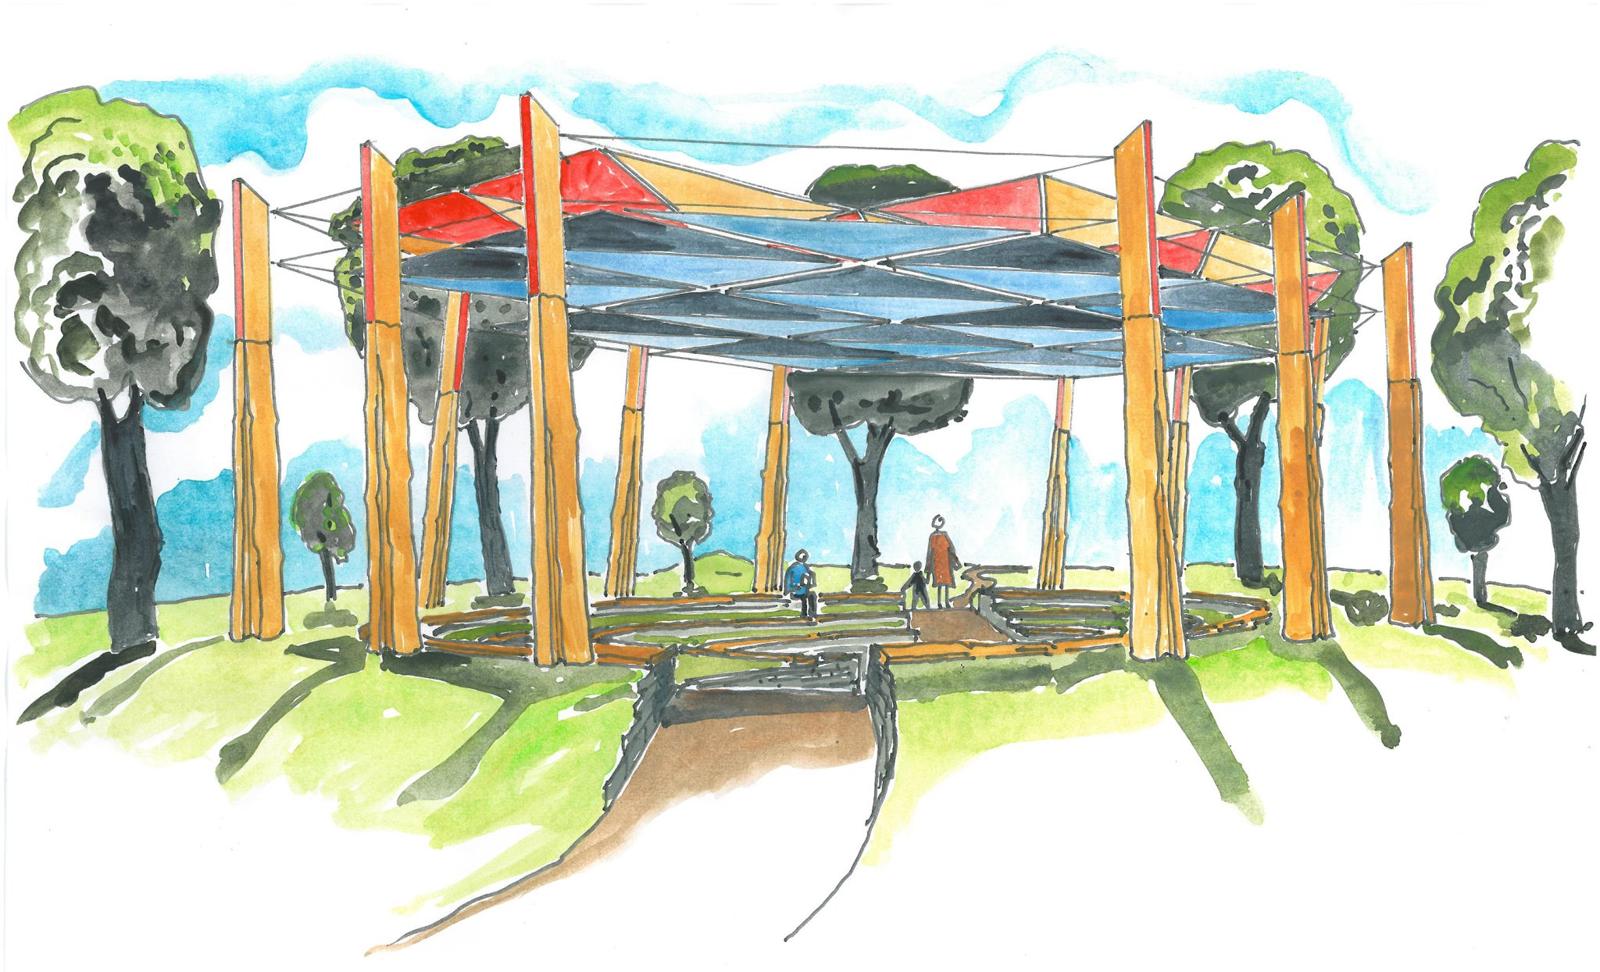 Idea workshopのアイデアを反映してできた空間デザイン(by Pomegranate Center)